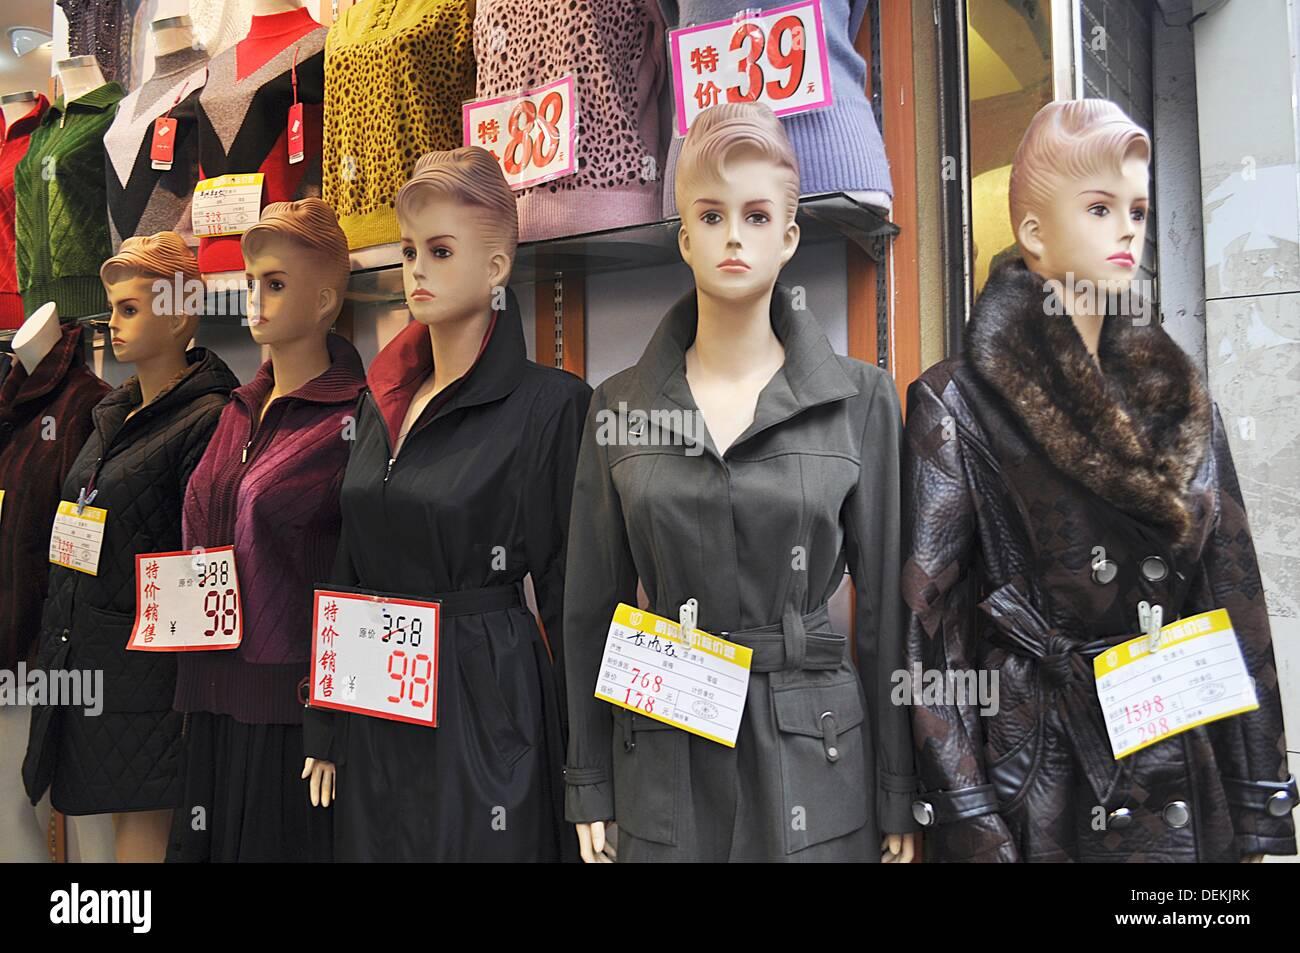 Shop For Cheap Clothes